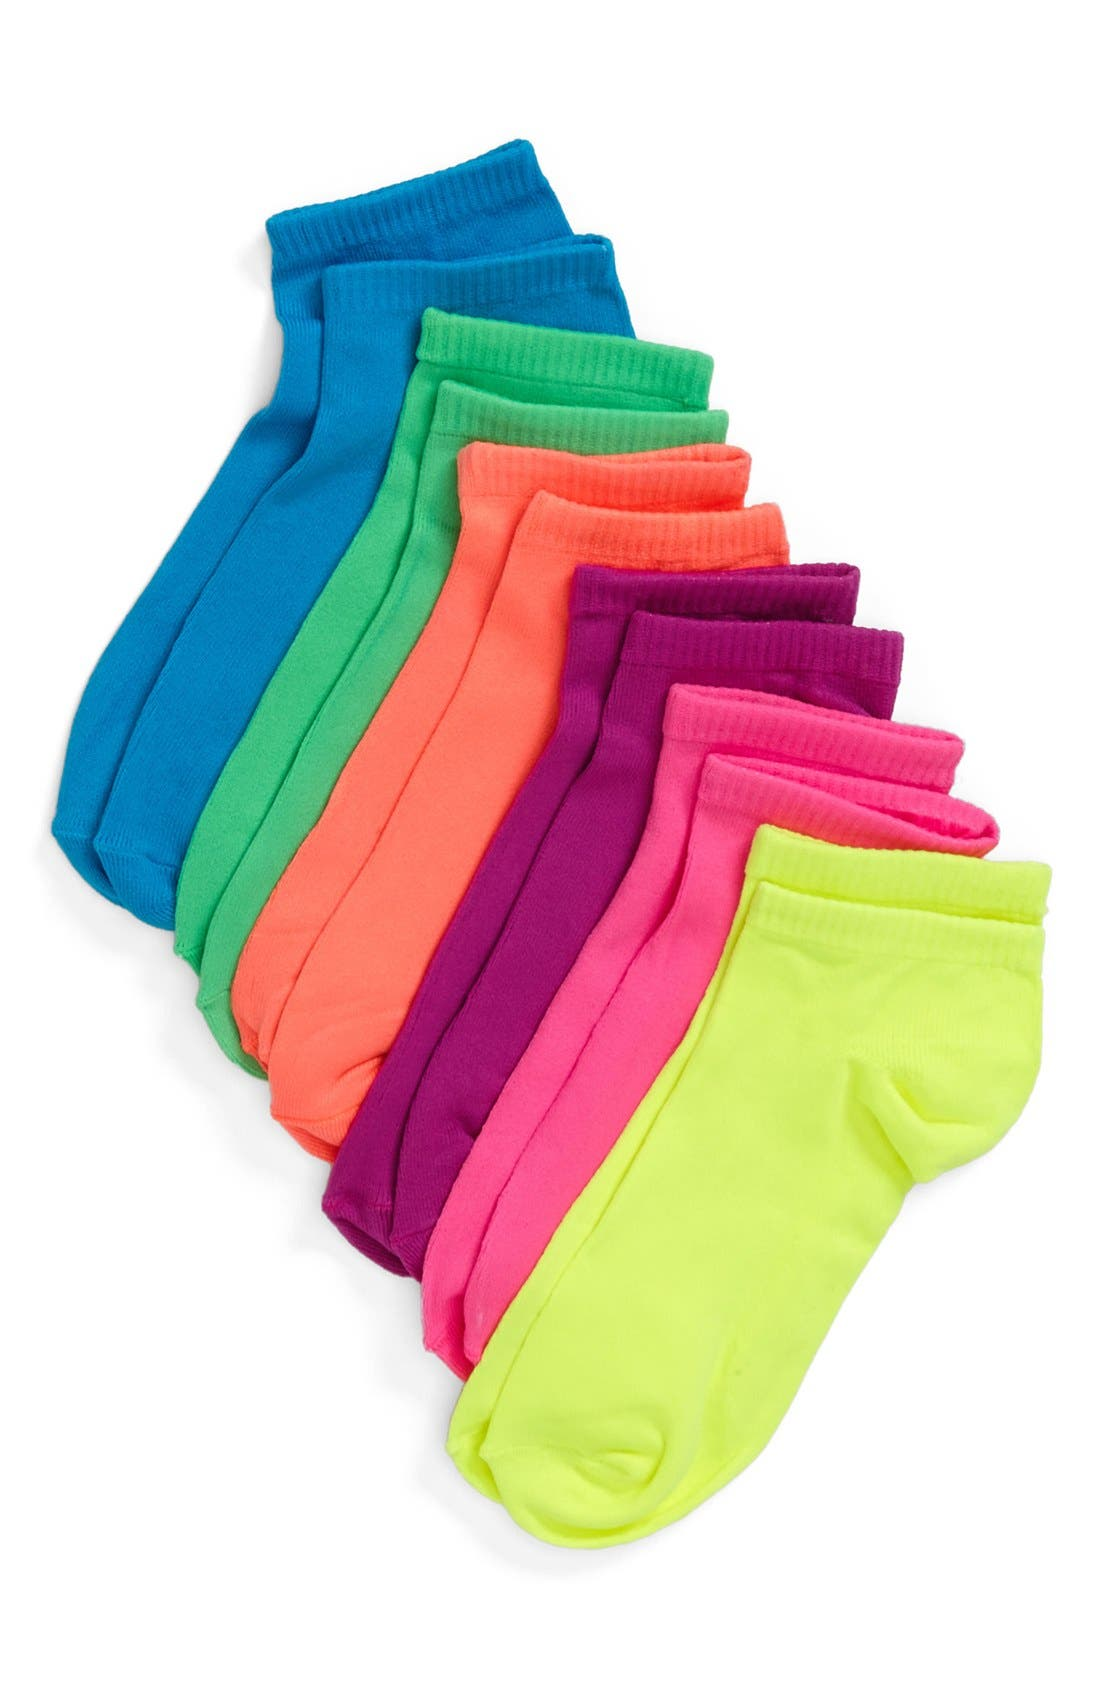 Alternate Image 1 Selected - Sox & Co. Microfiber No-Show Socks (6-Pack) (Women)